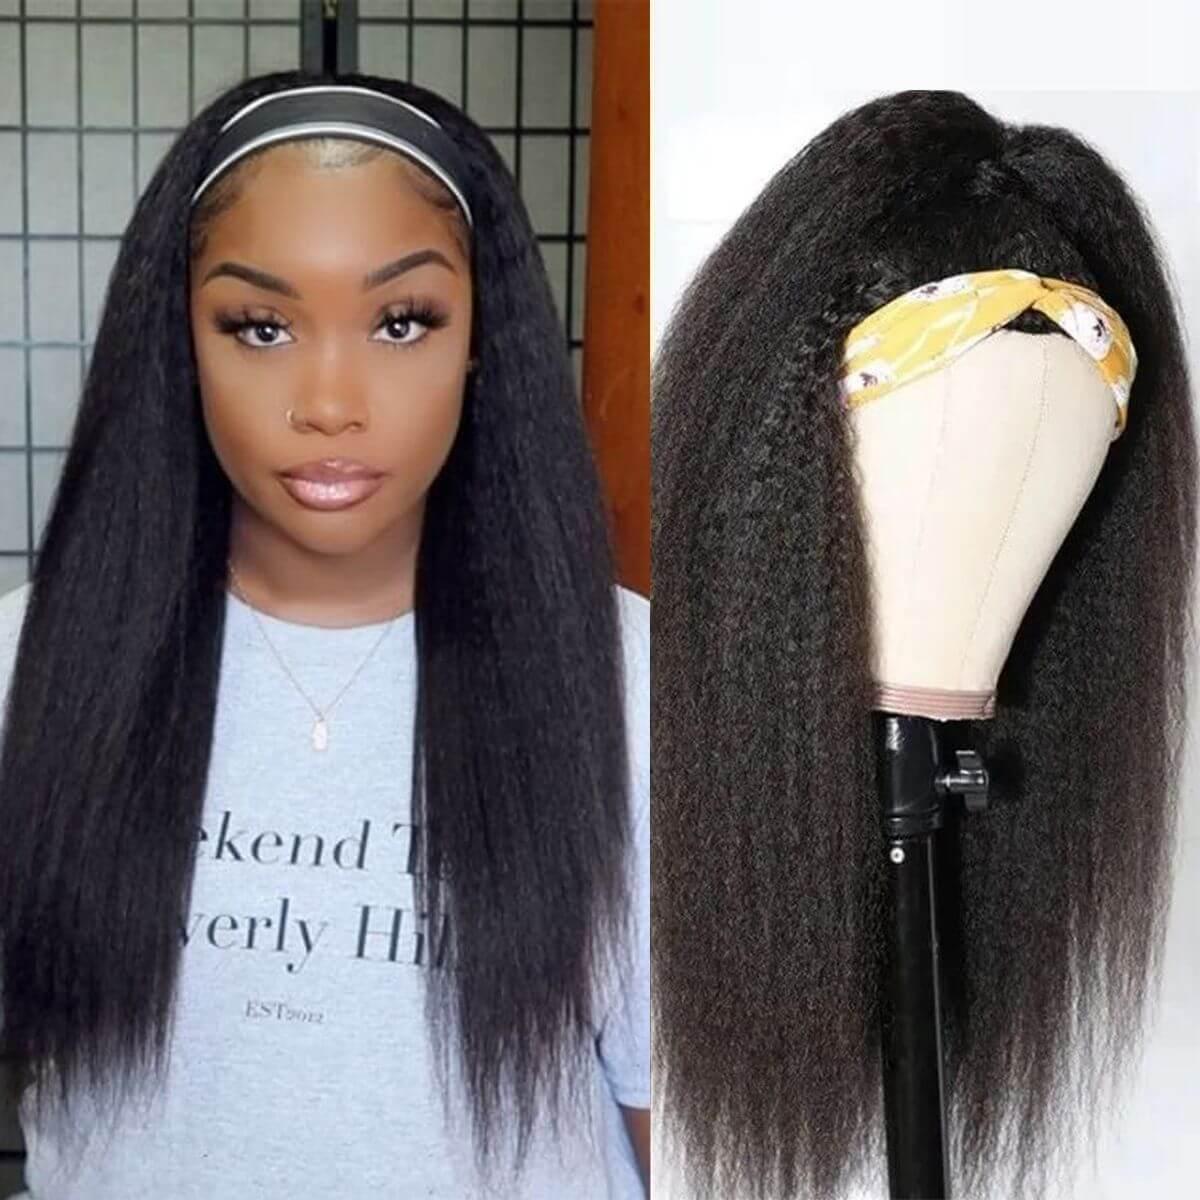 headbands wigs kinky straight,kinky straight headband wigs,kinky straight hair headband wig,best kinky straight headband wigs,cheap kinky straight headband wigs,full machine made wigs